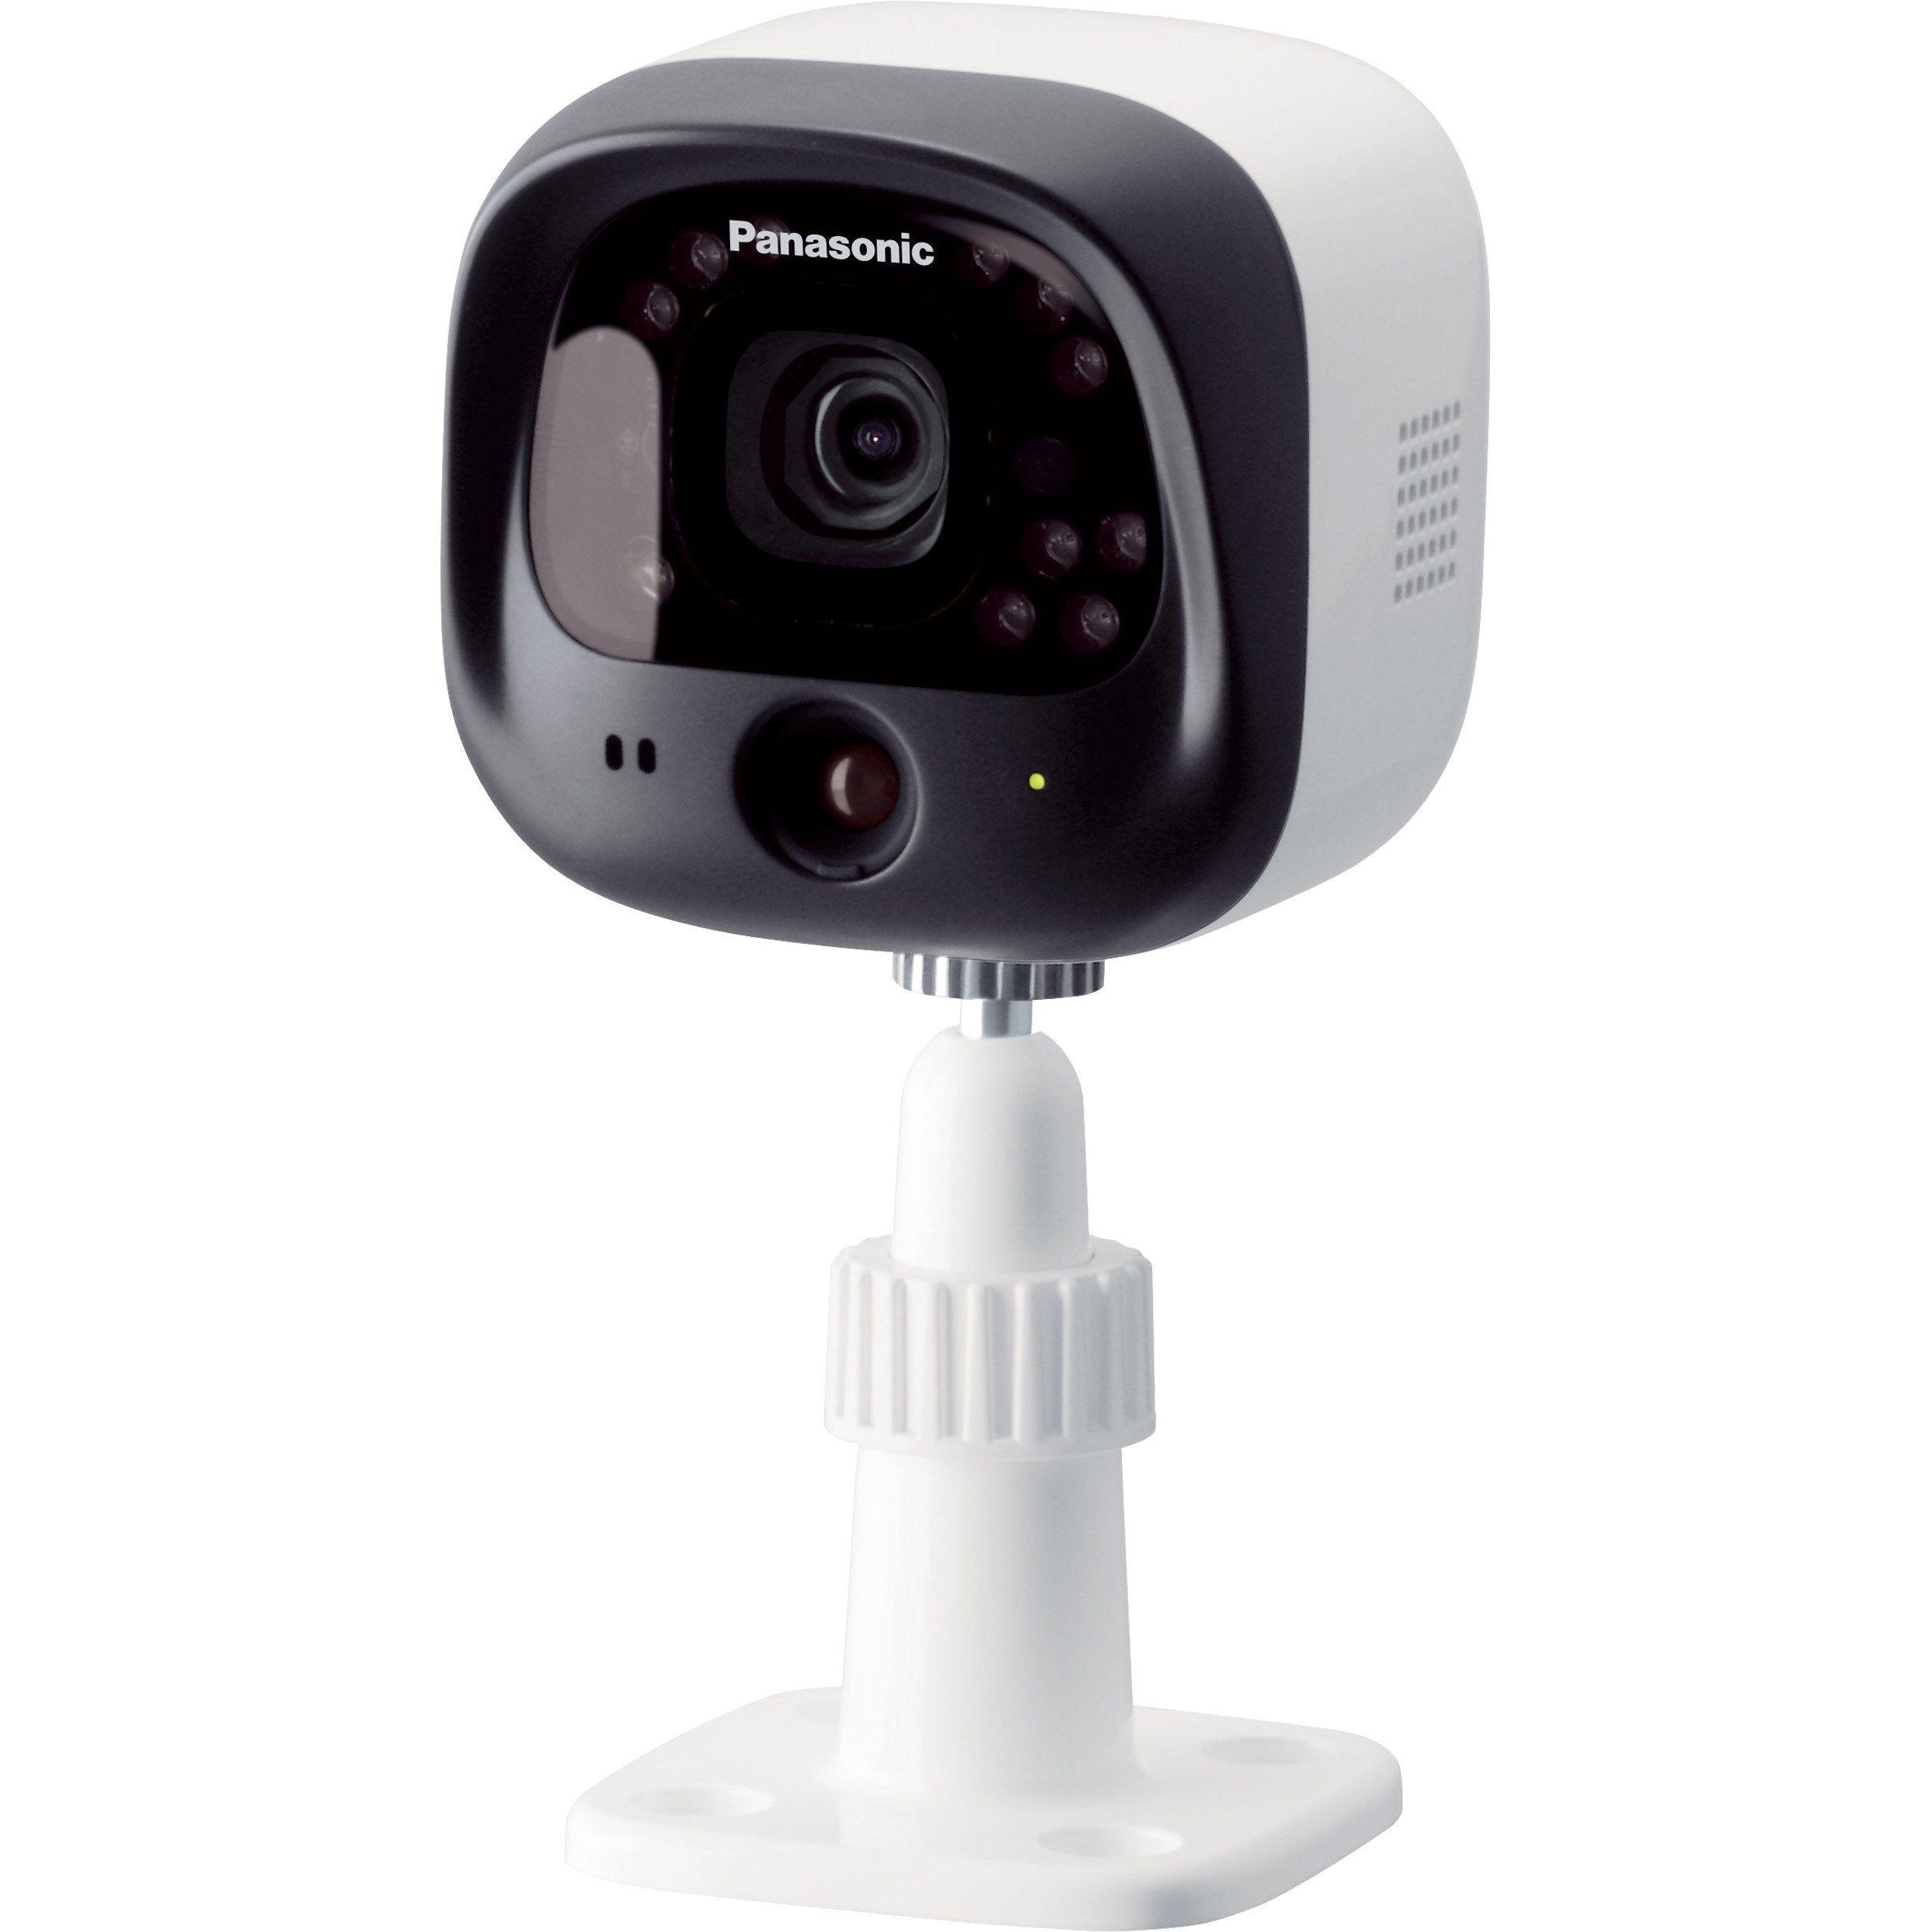 Camera De Surveillance Exterieure Ip Exterieure Panasonic Camera Surveillance Video Surveillance Camera